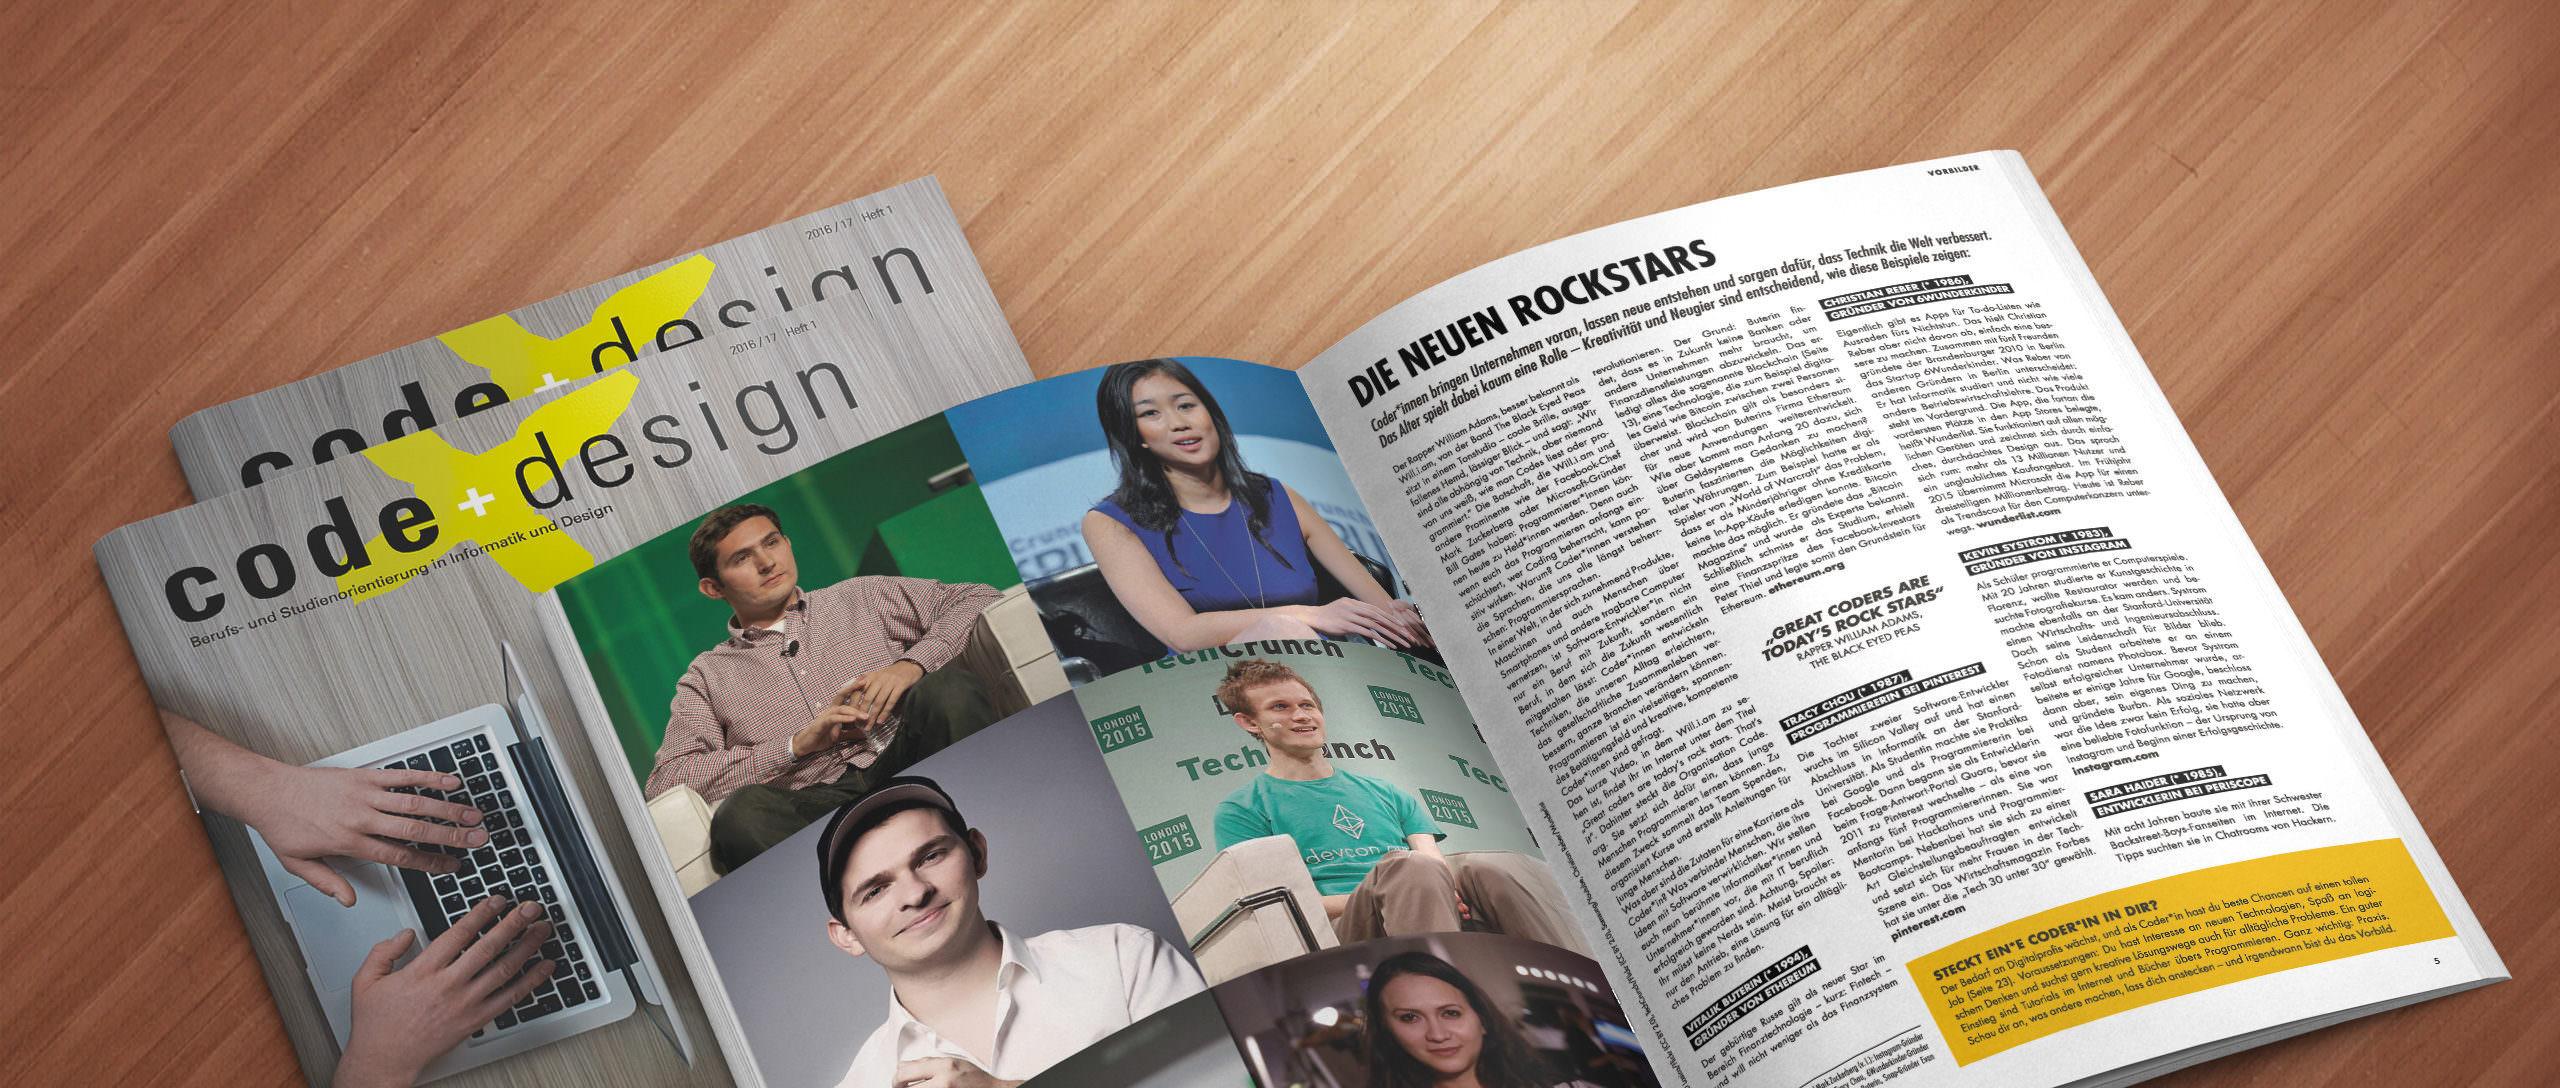 Das Magazin #1 - 2017/2018